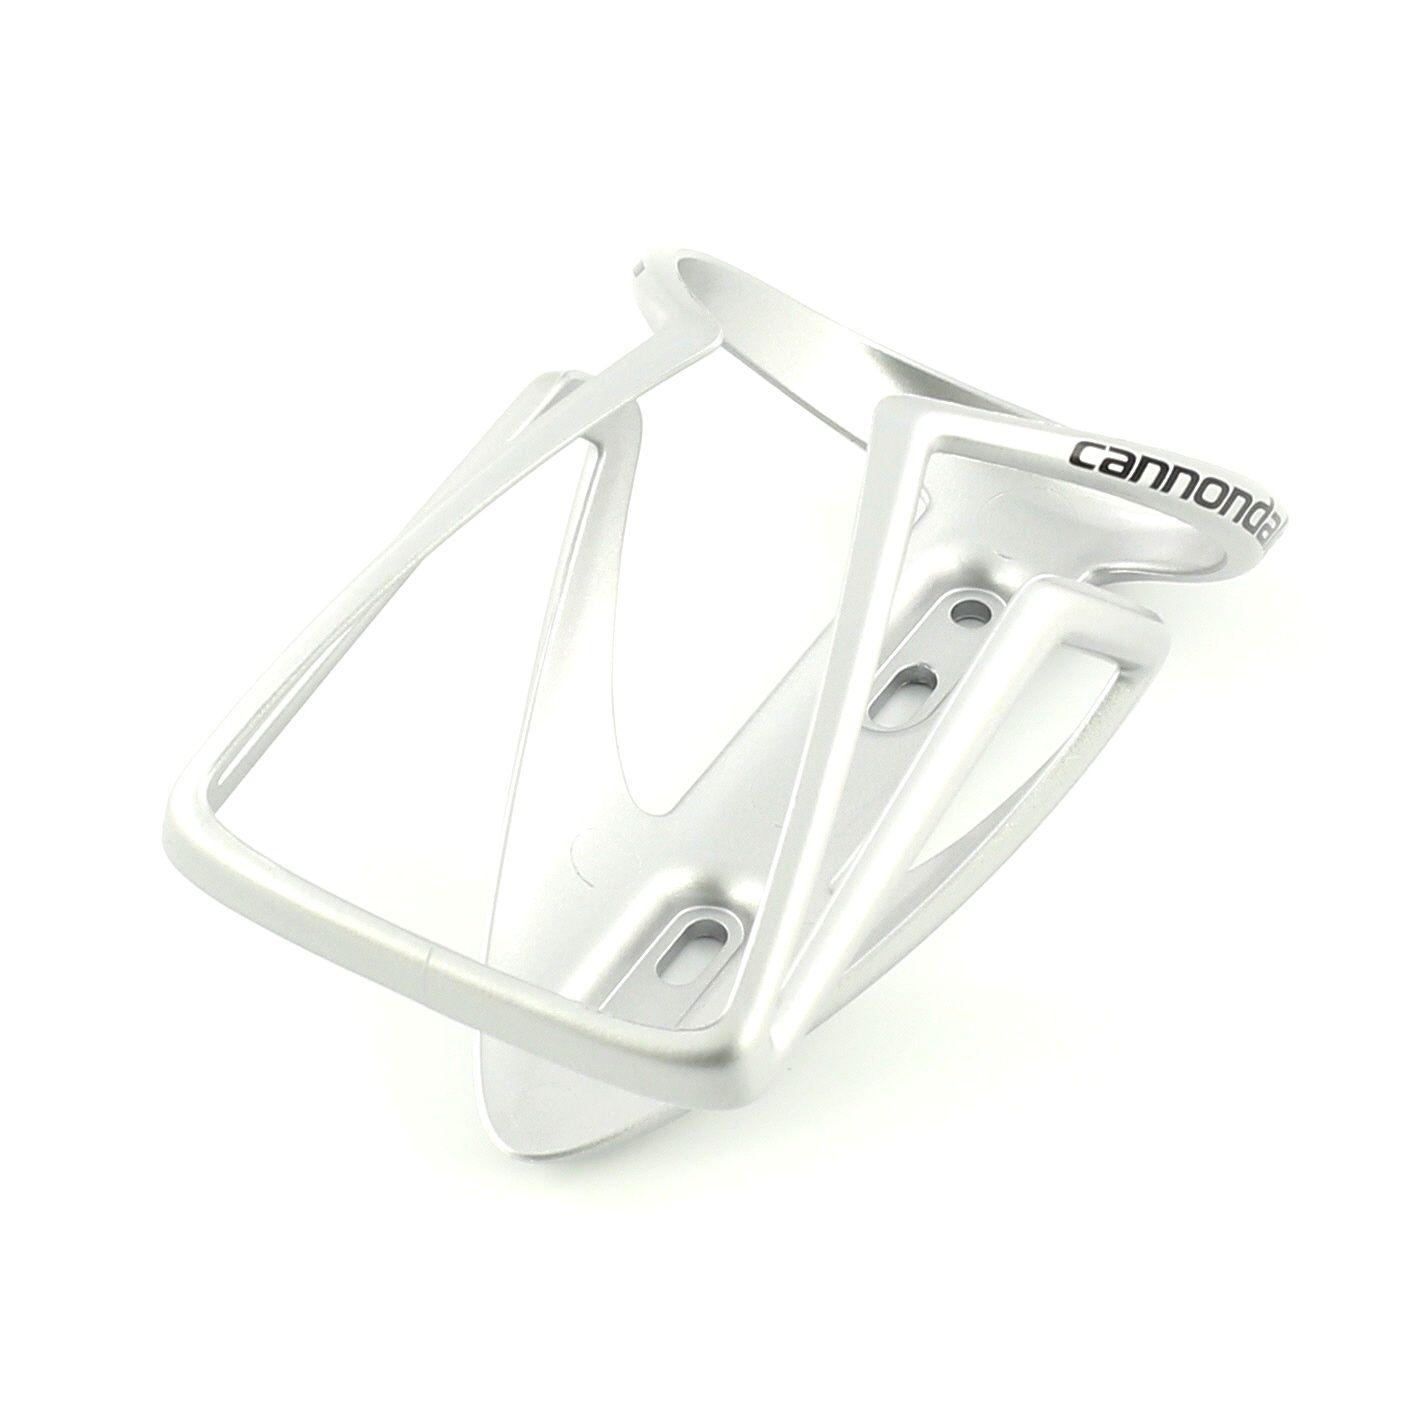 Porte-bidon Cannondale Nylon Speed-C (Argent Ion)